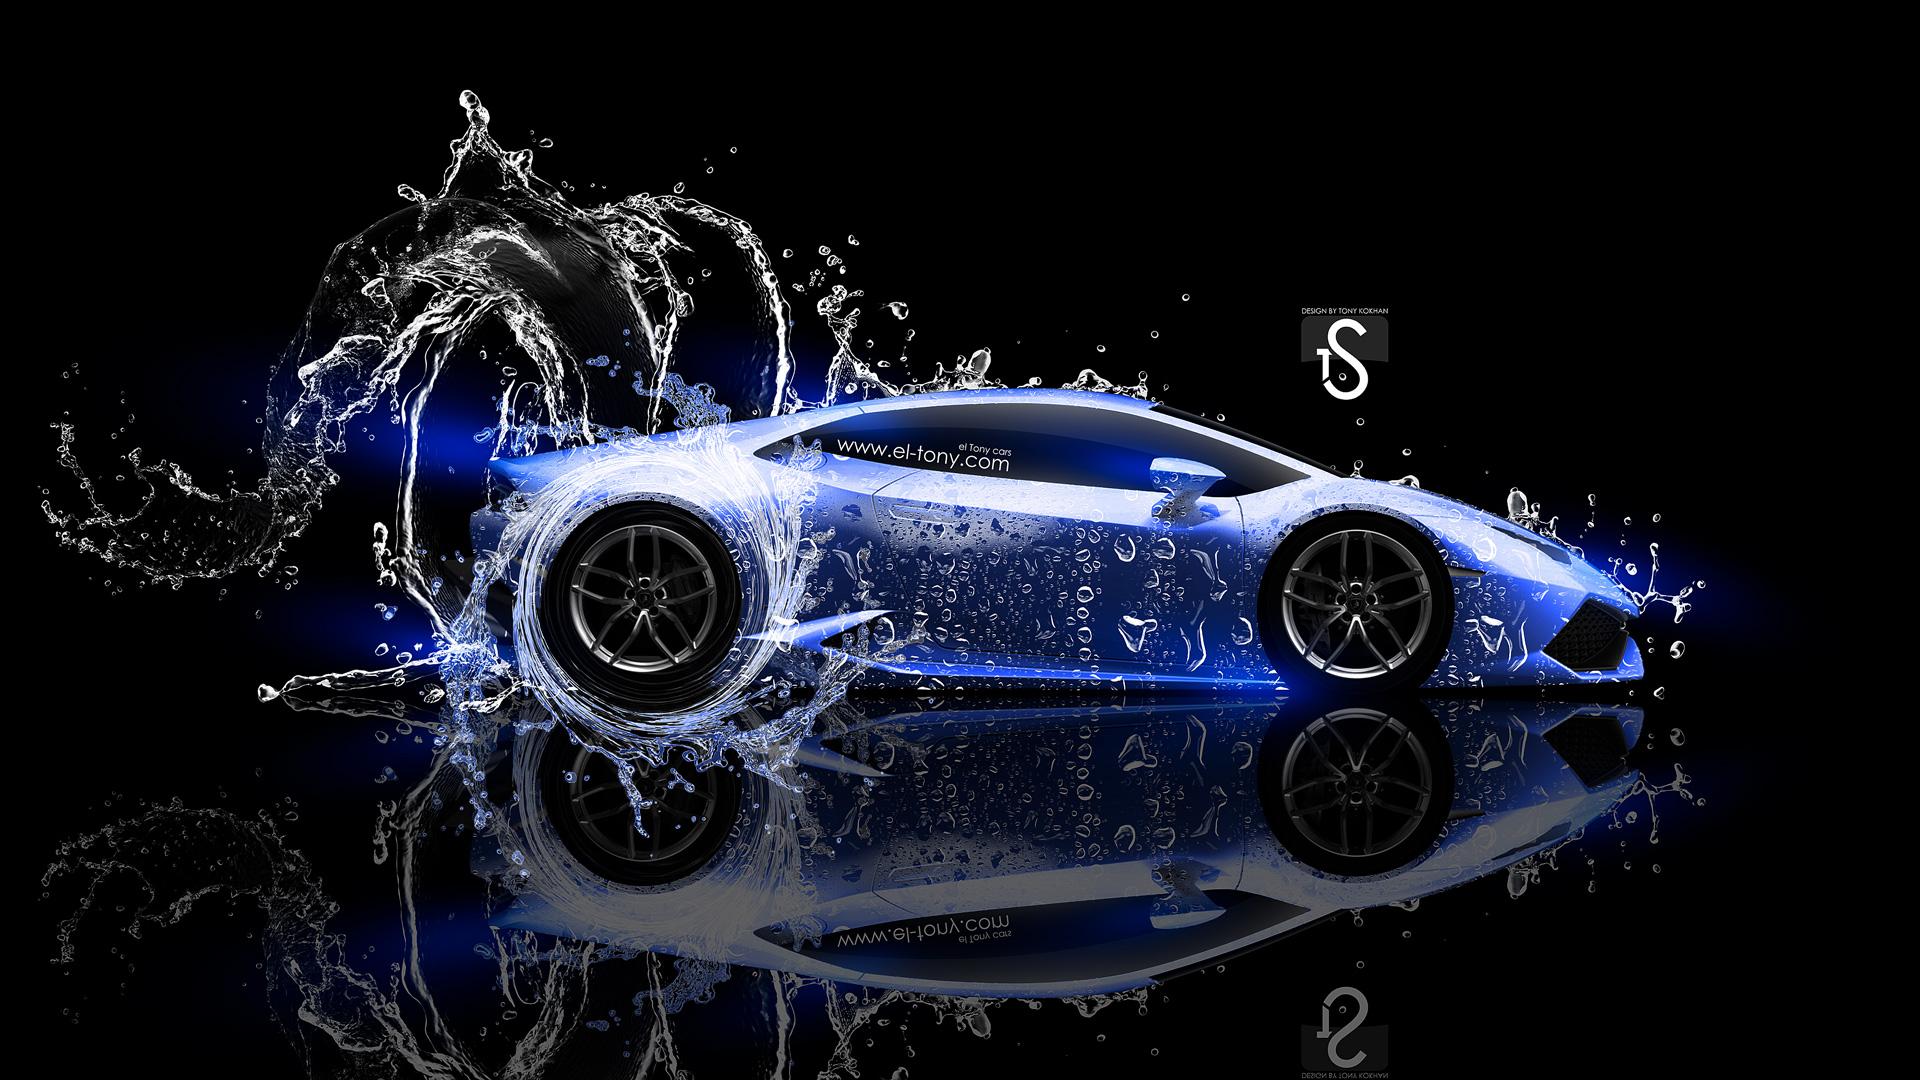 Lamborghini Huracan LP610 4 Super Water Car 2014 Blue Neon HD Wallpapers By Tony Kokhan El